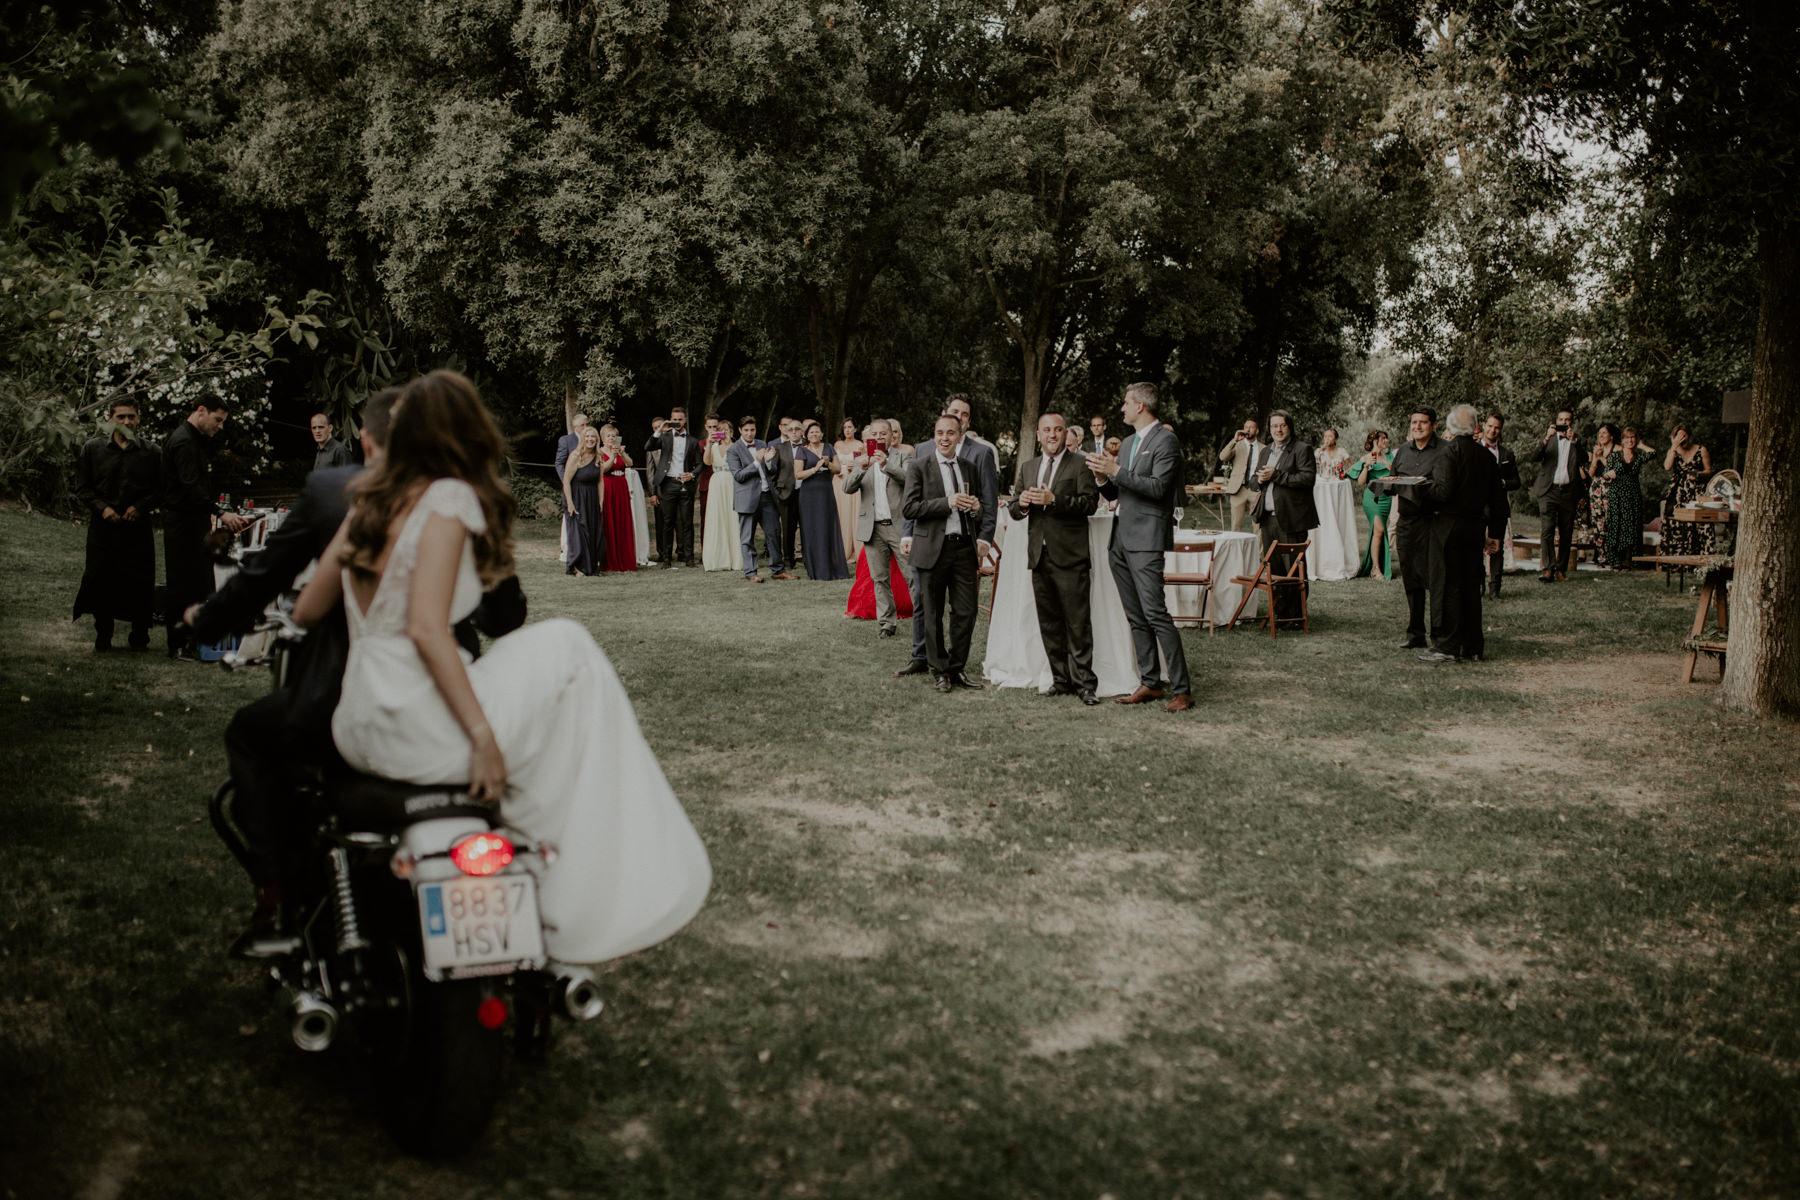 alt_thenortherngirlphotography_couples_weddingphotographer_photographer_wedding_boda_fotografodebodas_fotografobodasbarcelona_bodaindie_bodasconestilo_bodaensantperedeclara_jennifermiguel-598.jpg